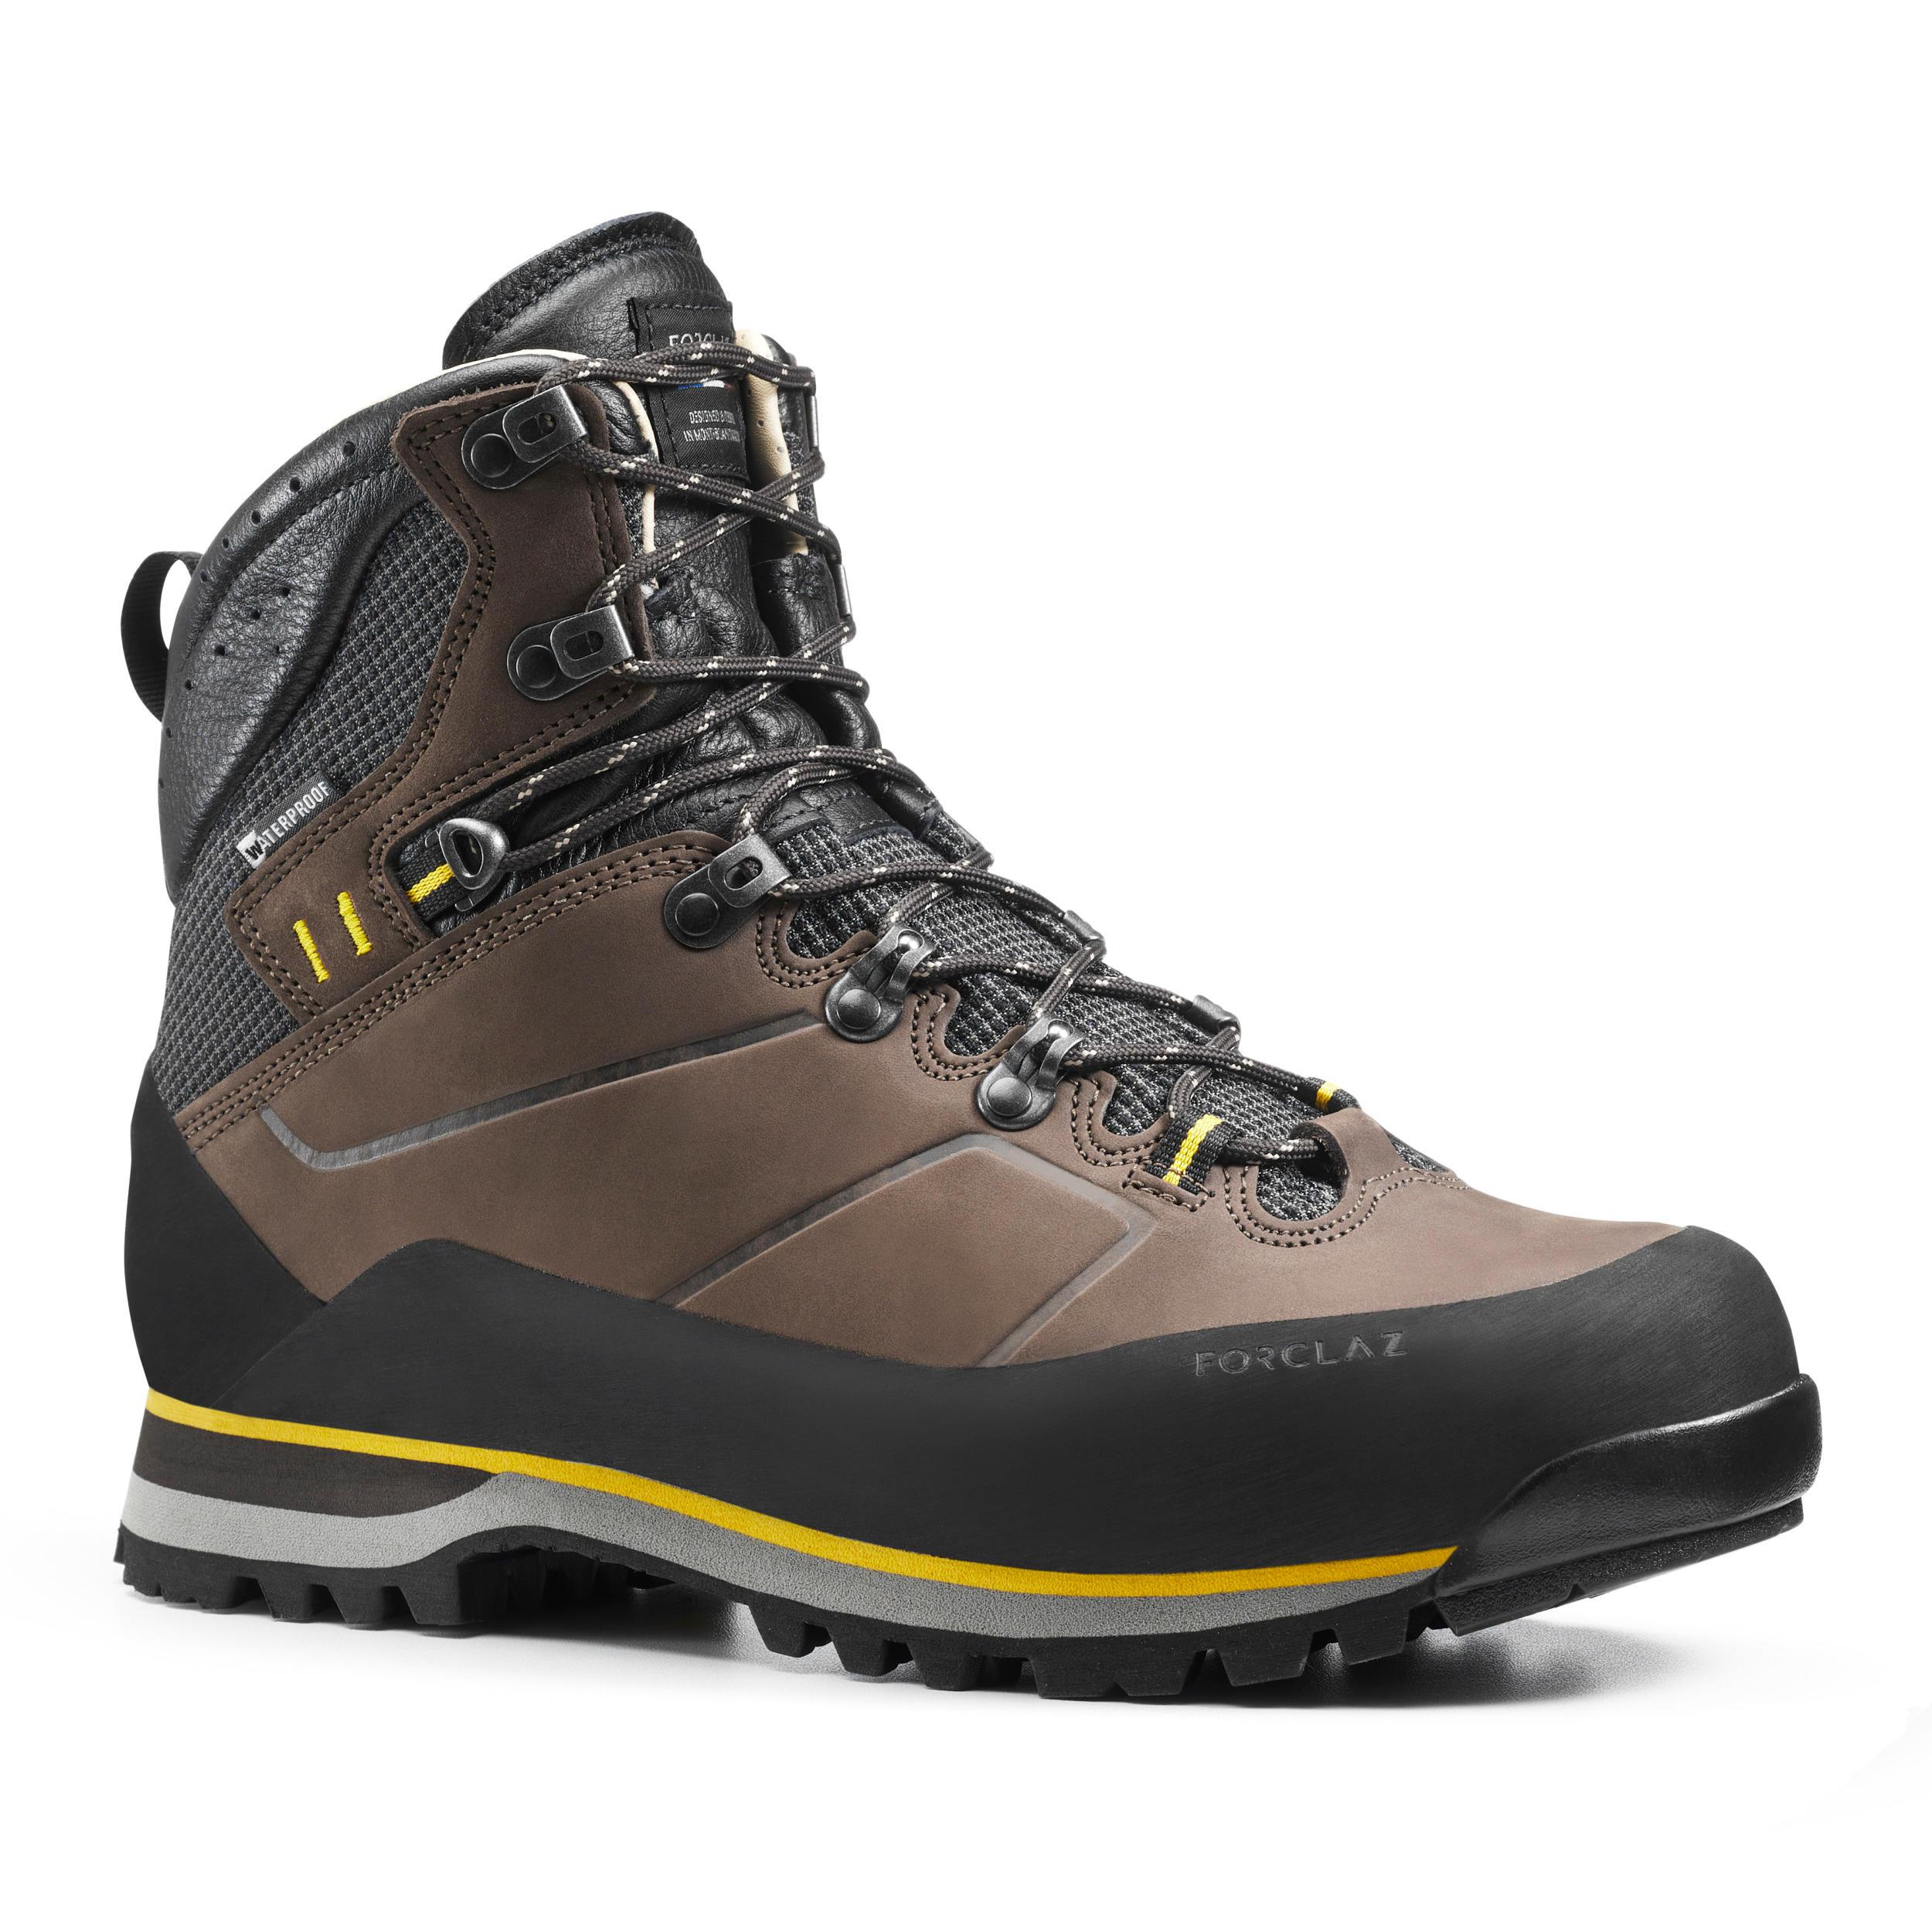 Trekkingschuhe Trek 900 V2 Herren wasserdicht | Schuhe > Outdoorschuhe > Trekkingschuhe | Forclaz